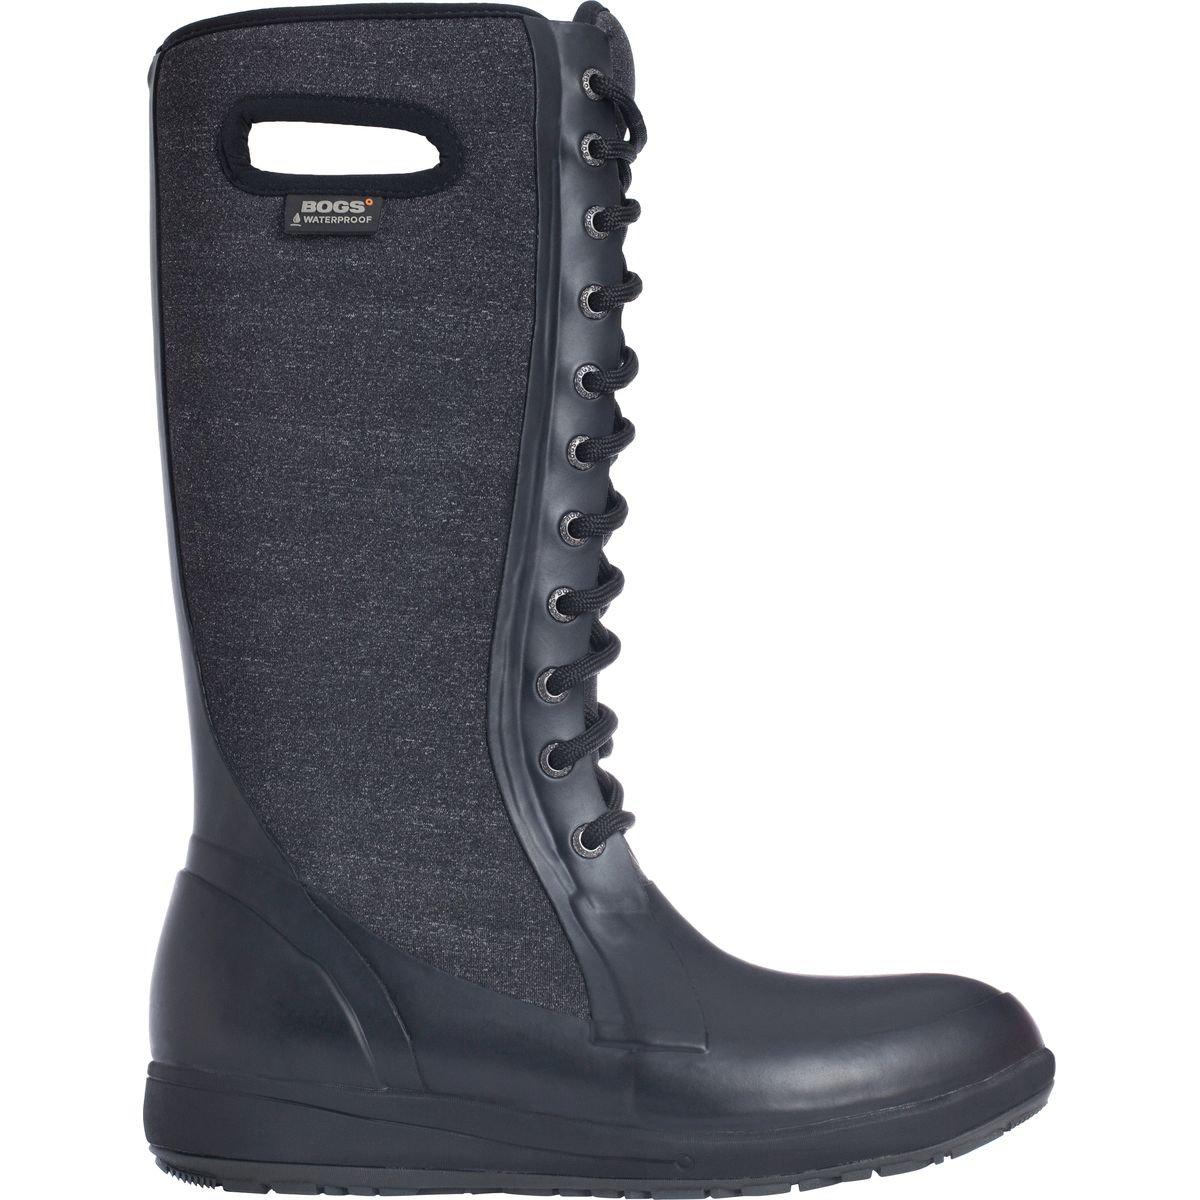 Bogs Women's Cami Lace Tall Melange Waterproof Winter Boot Blk Mlti 7 M US